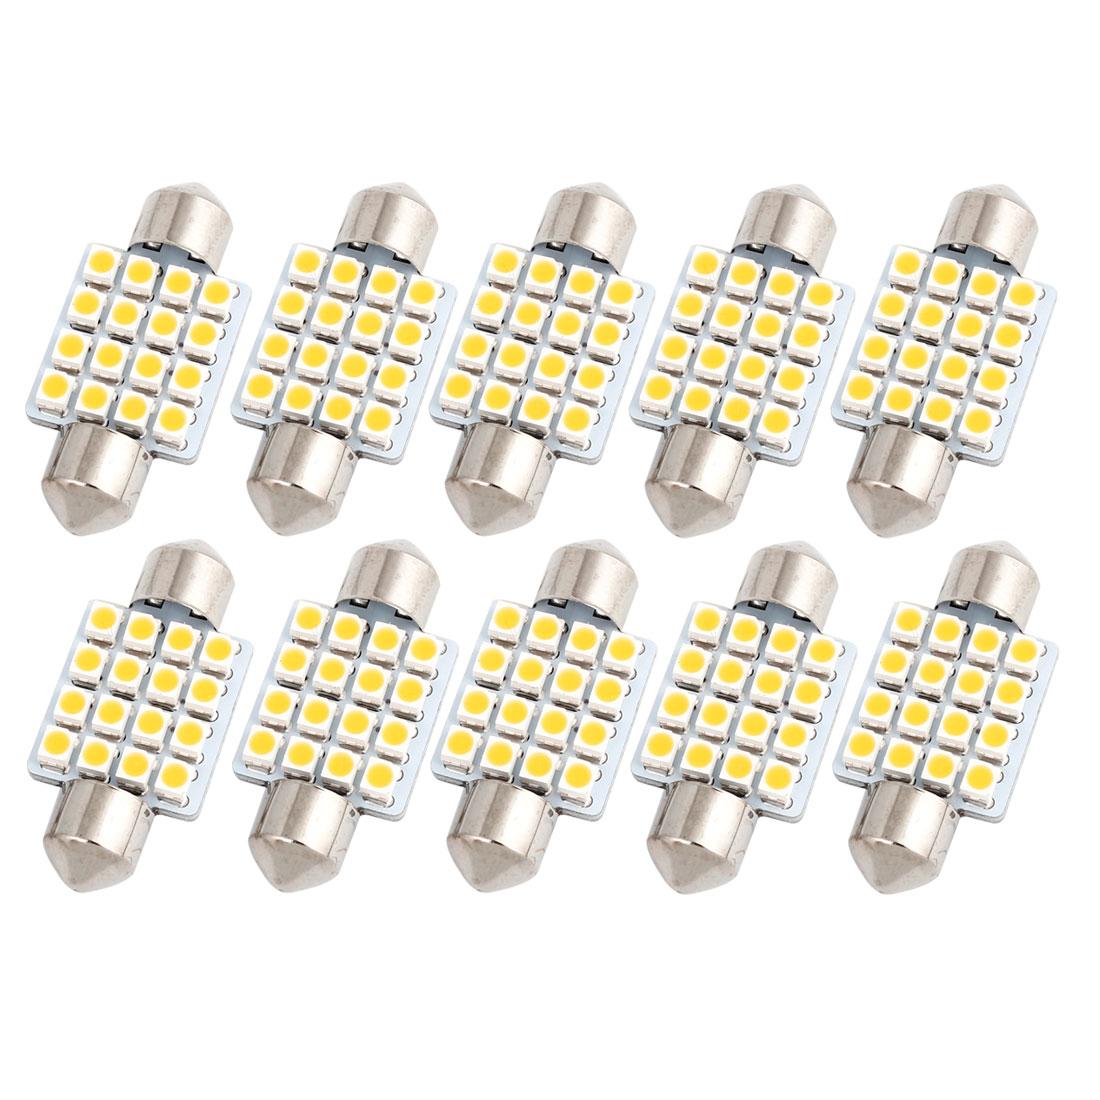 "10PCS 36mm 16-SMD 1.5"" 1210 LED Warm White Festoon Dome Light Lamp 6411 Internal"